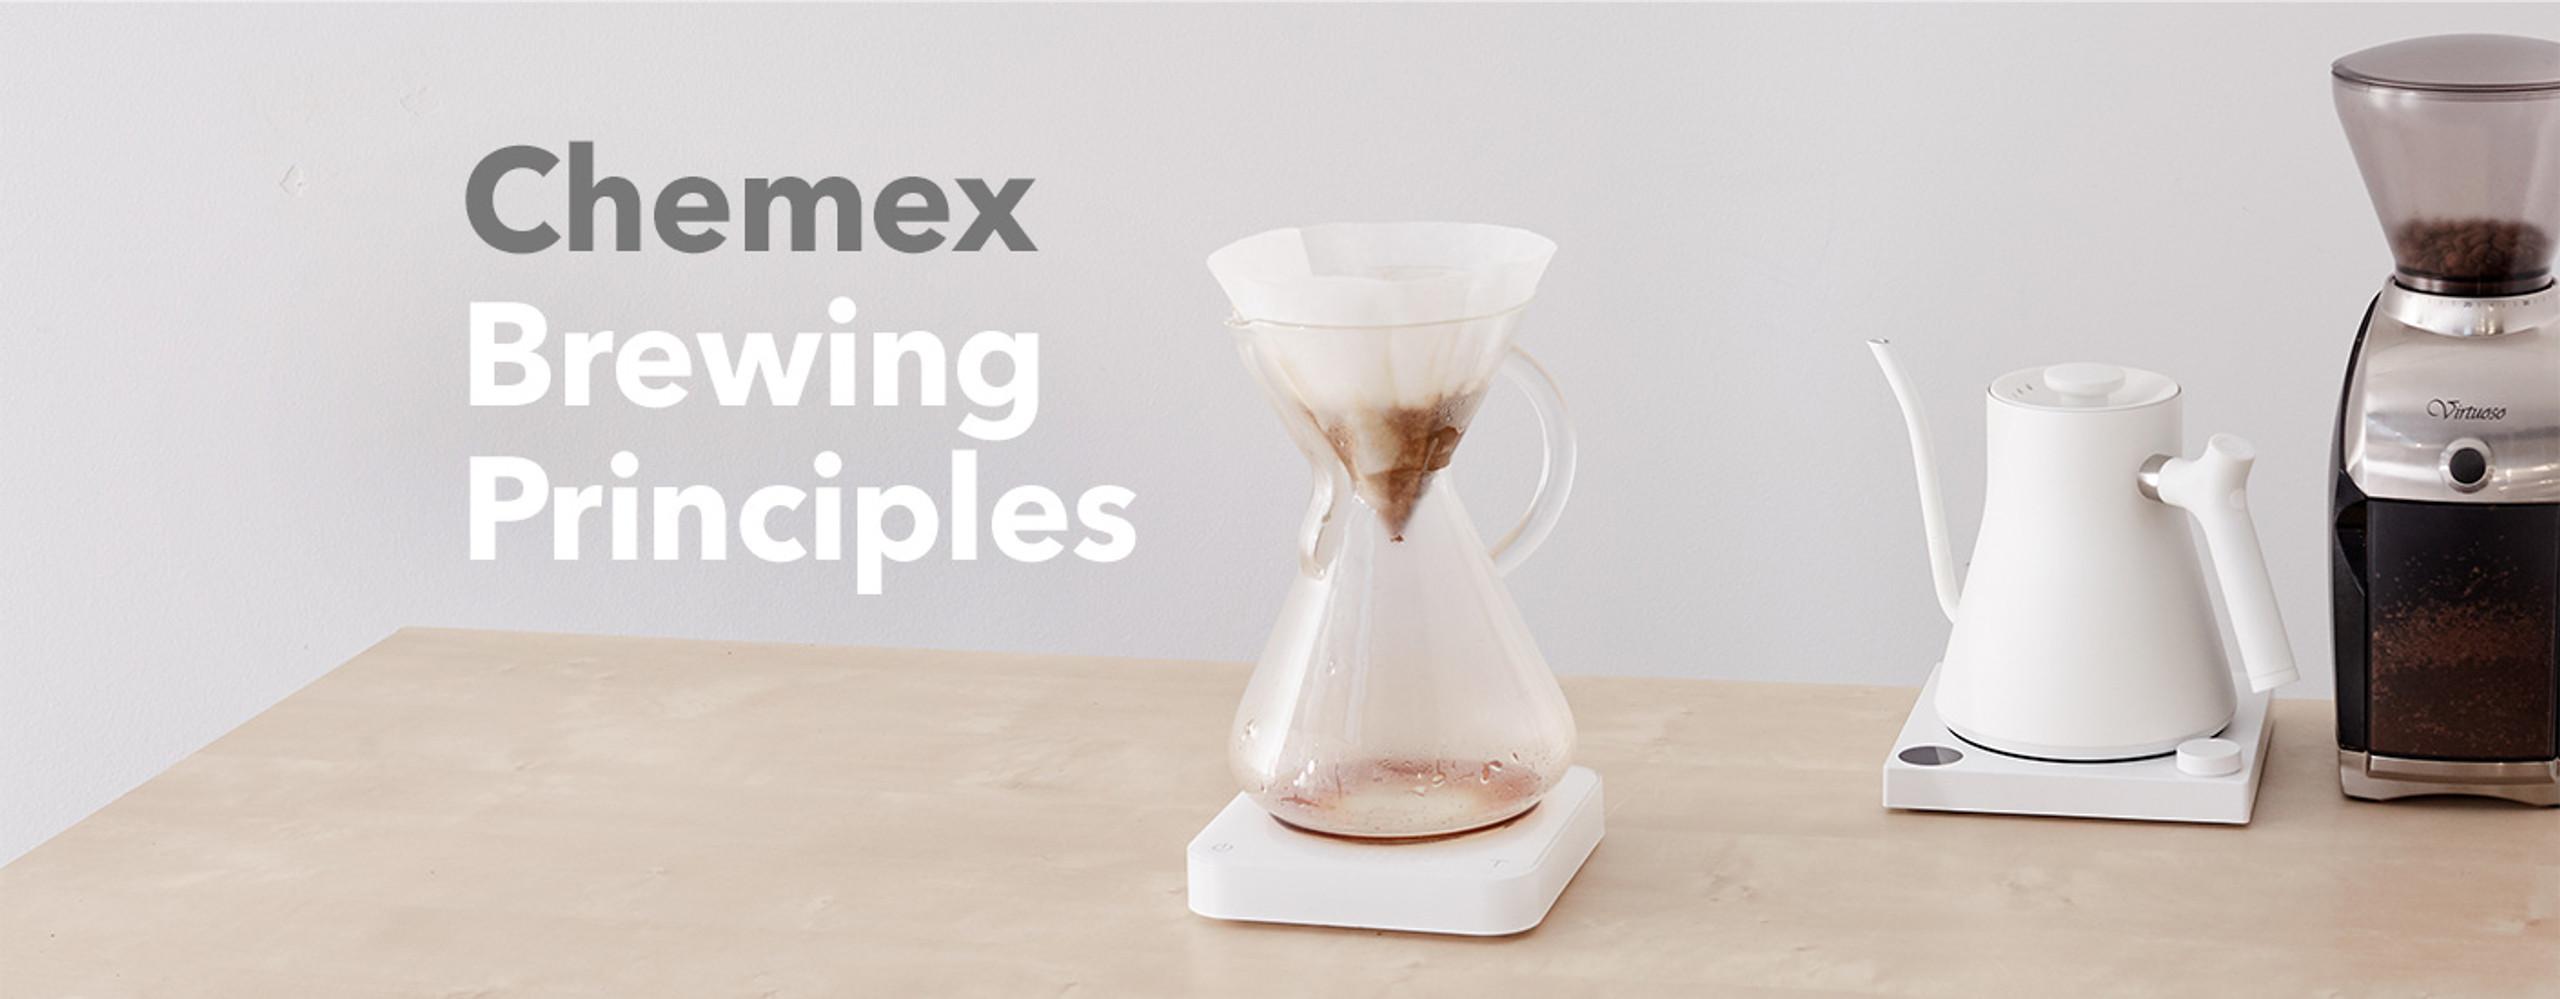 Chemex Brewing Principles